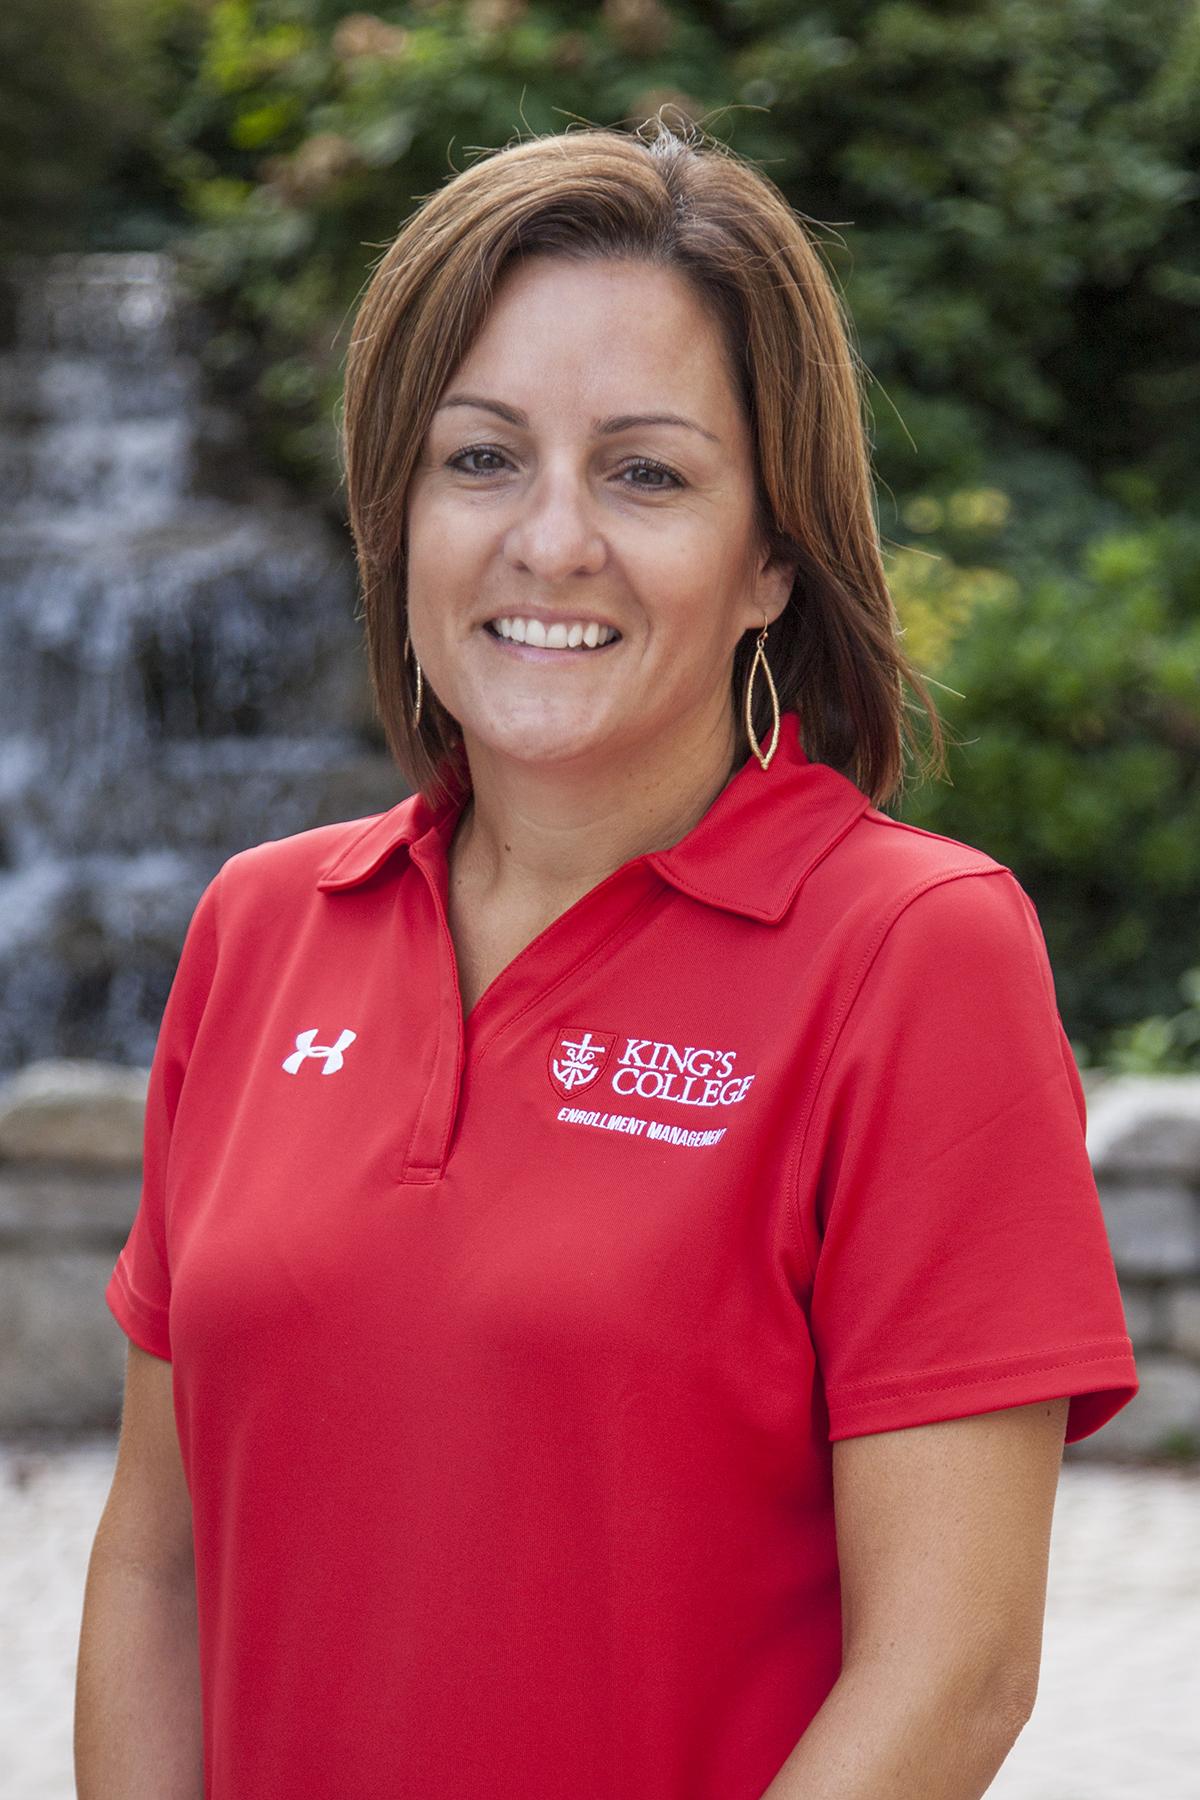 Kristin O'Callaghan